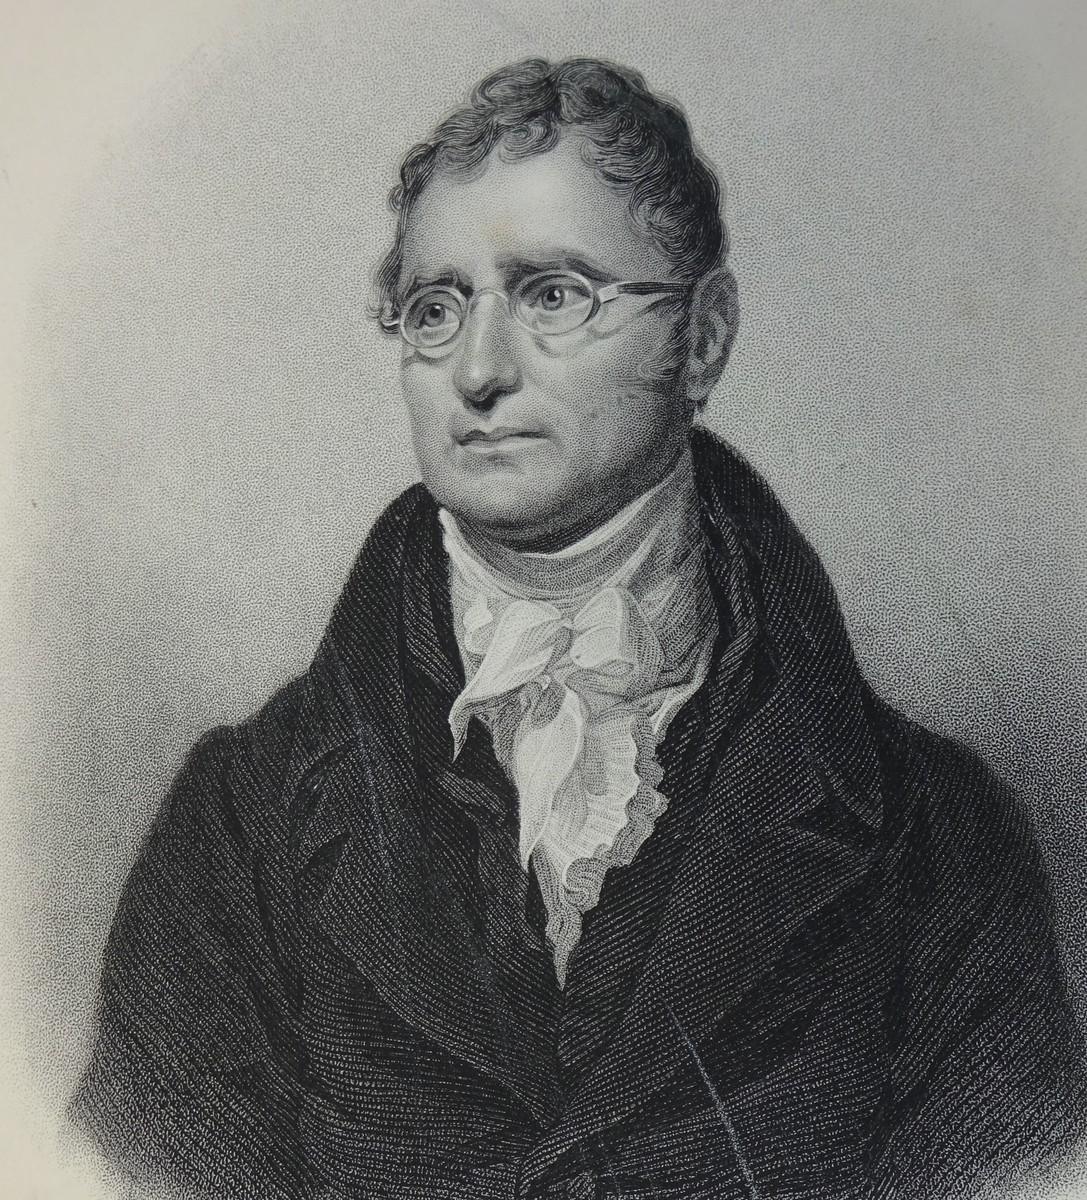 George Thomson, Public domain, via Wikimedia Commons